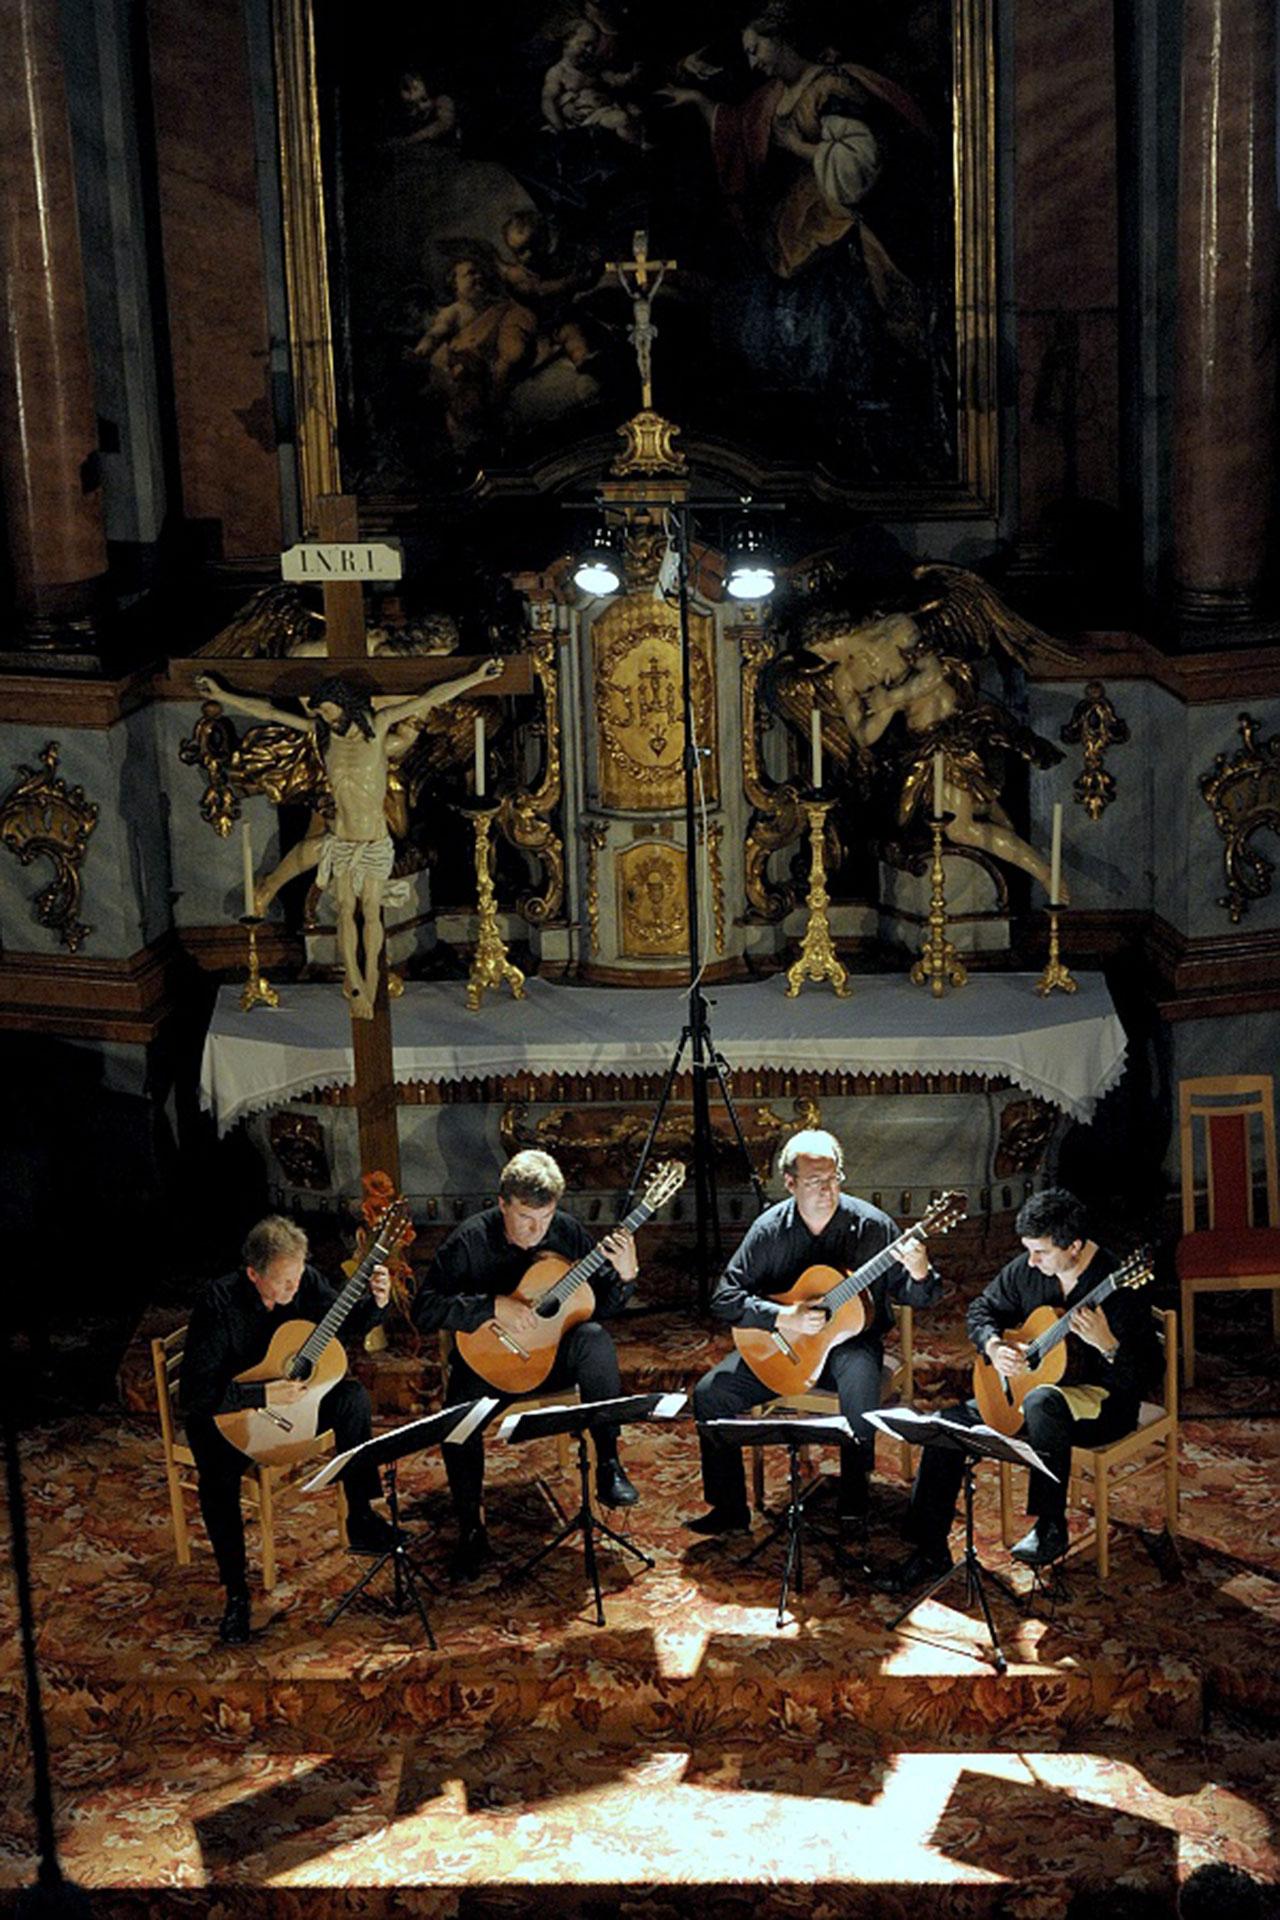 capalest-quatour-de-guitares-de-versailes-15-08-13-fotocluzina-6-2